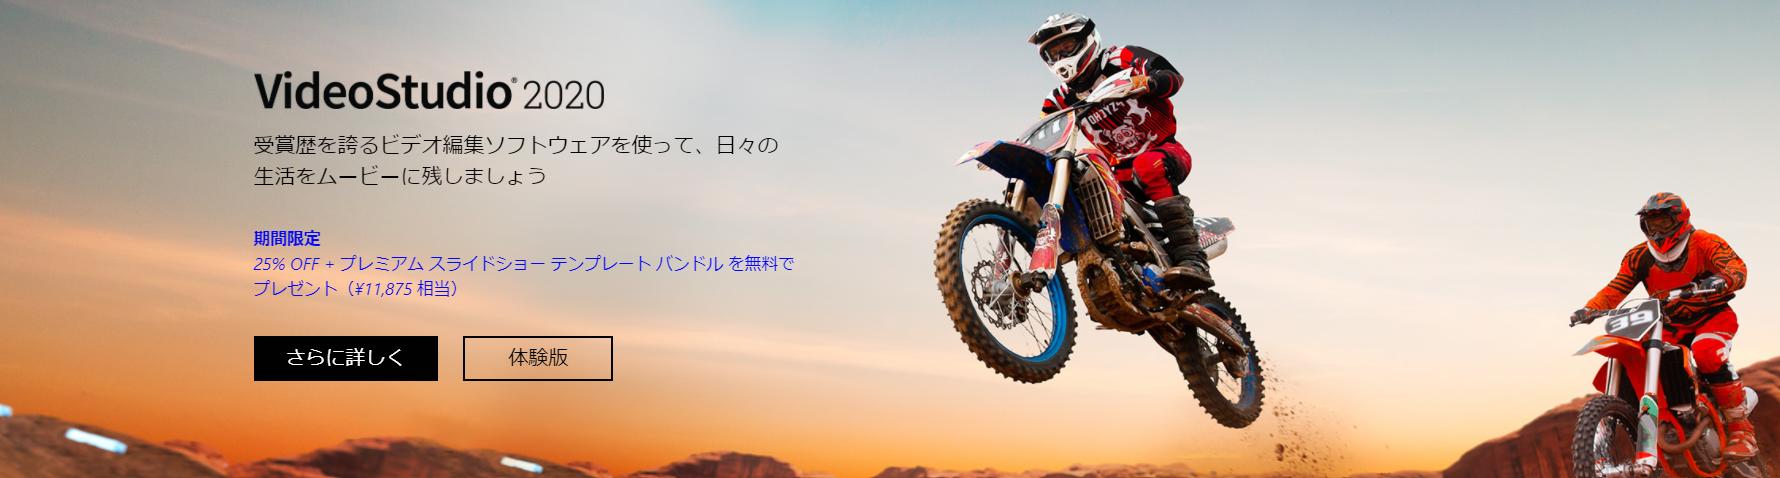 VideoStudio Pro2020サービスサイト キャプチャ